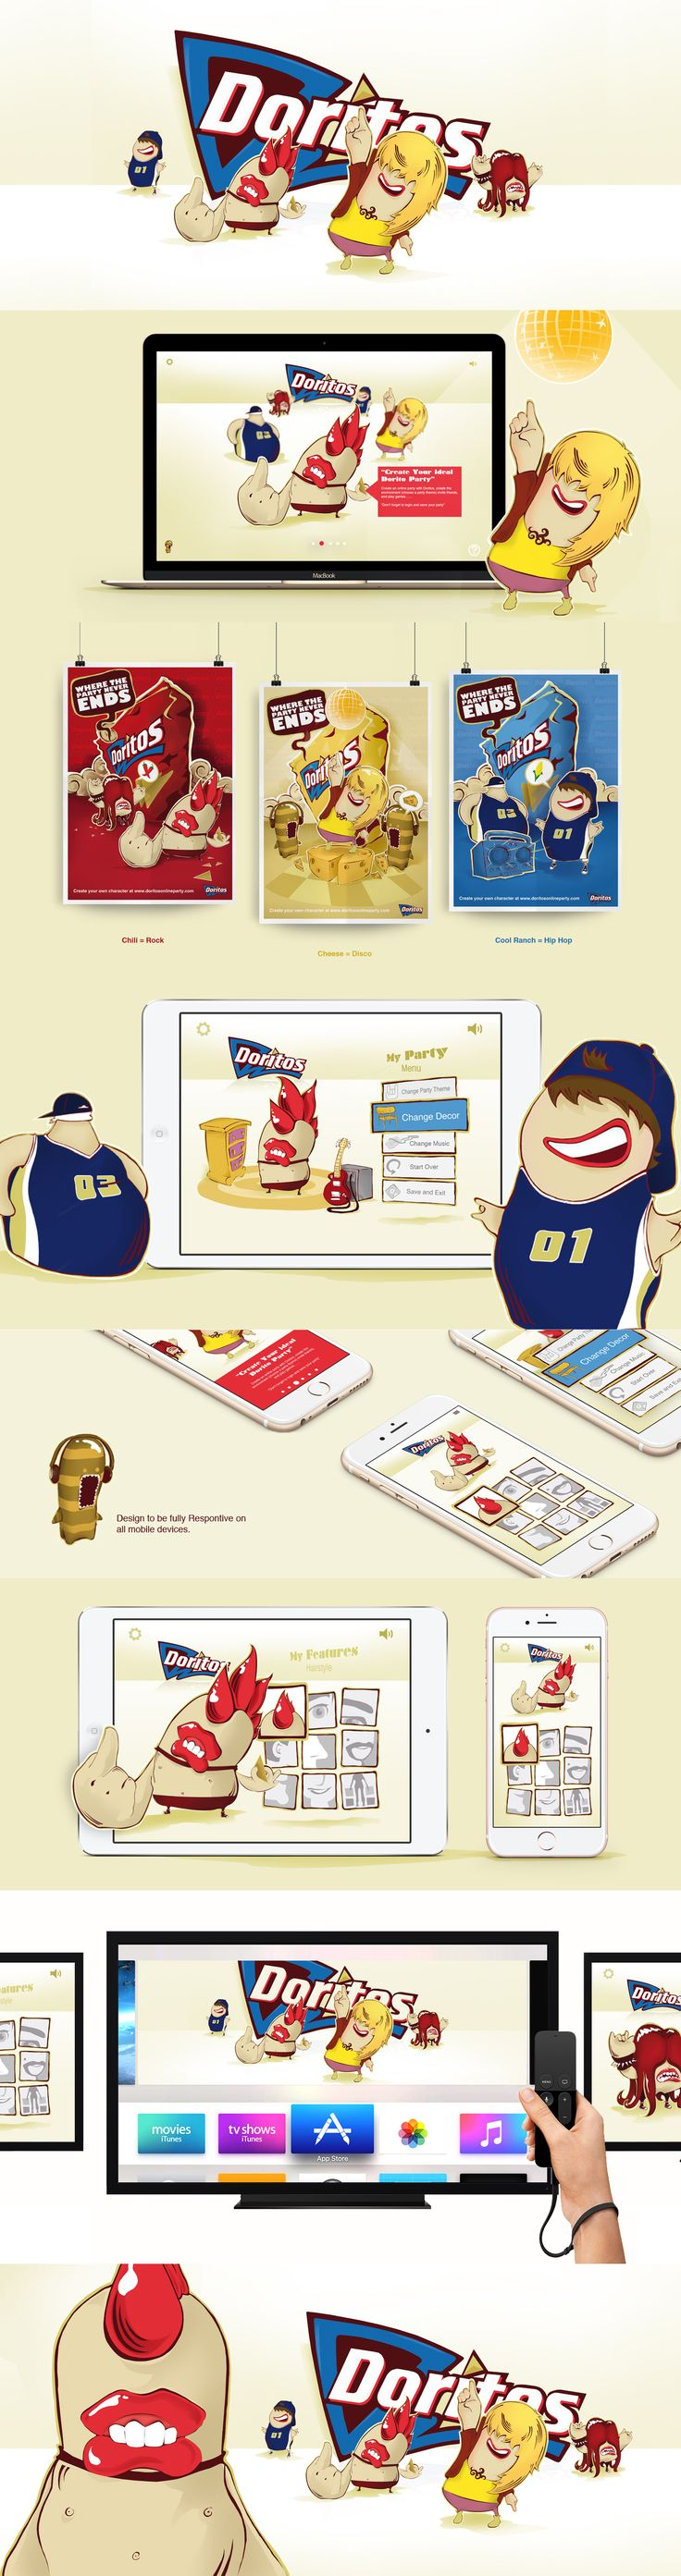 "Come check out ""Doritos"" Web Design & Illustration by Emblem, Visit www.emblem.ie for more projects"